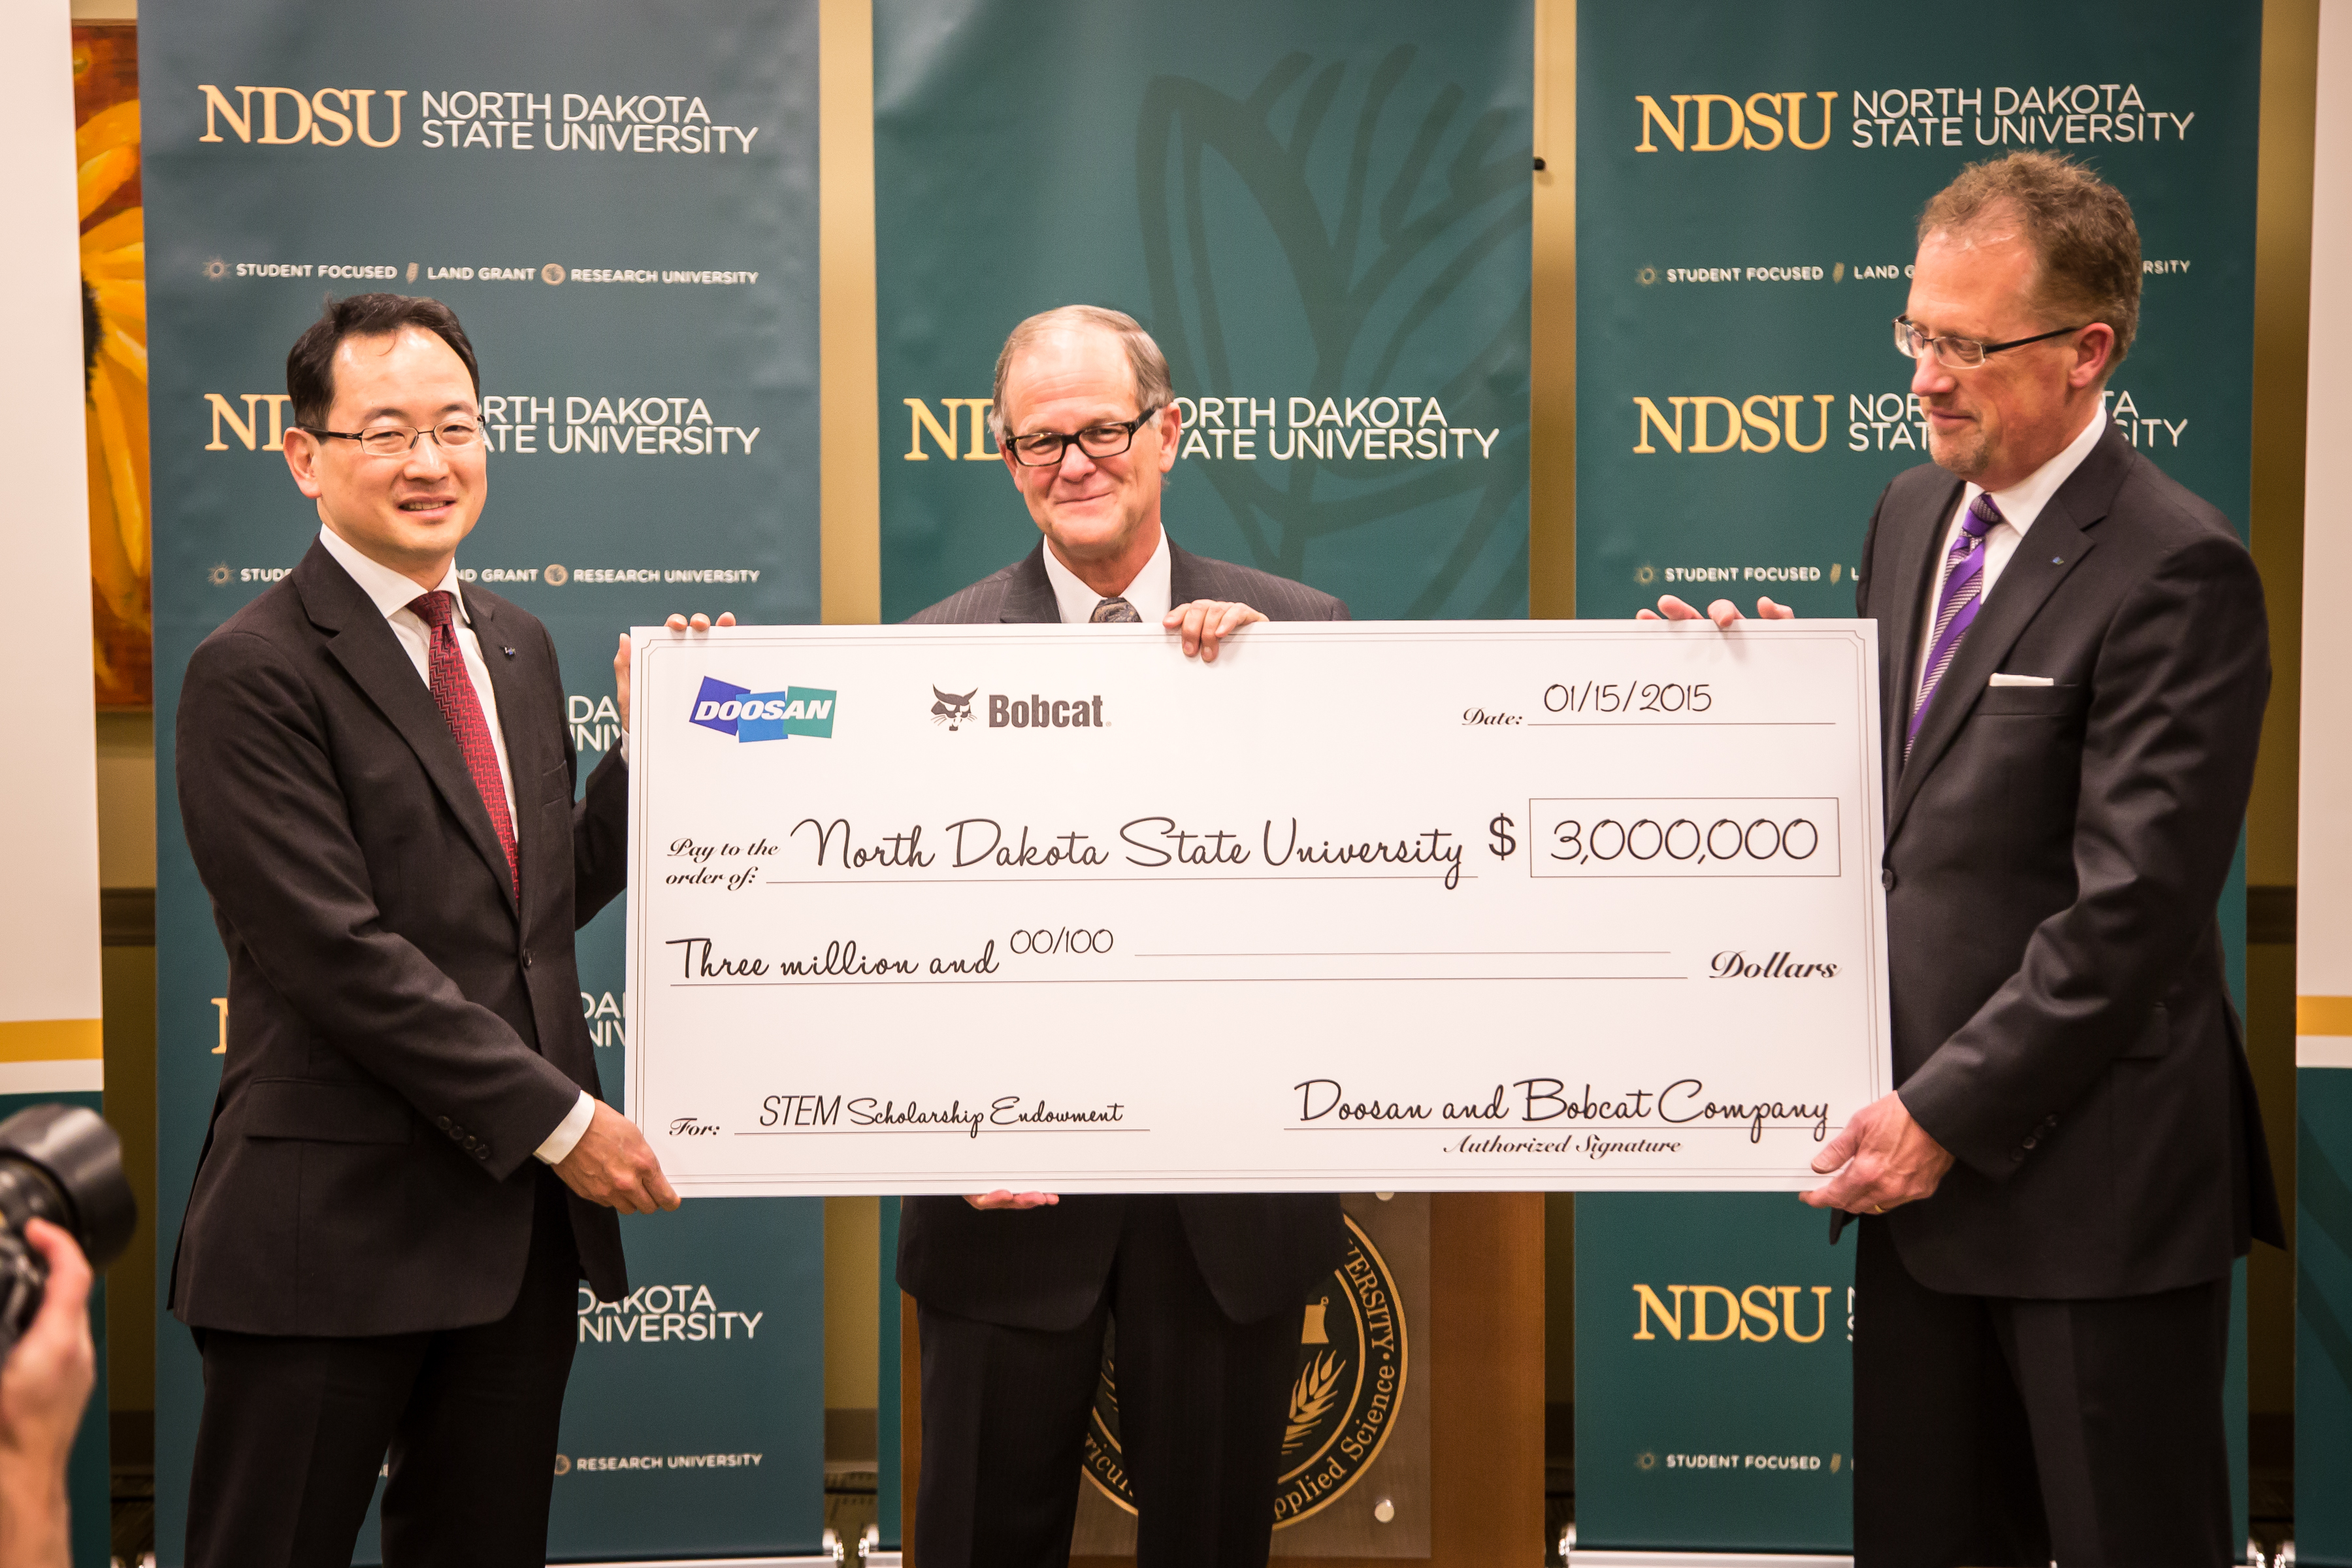 Doosan and Bobcat Company Donate $3 Million to NDSU for